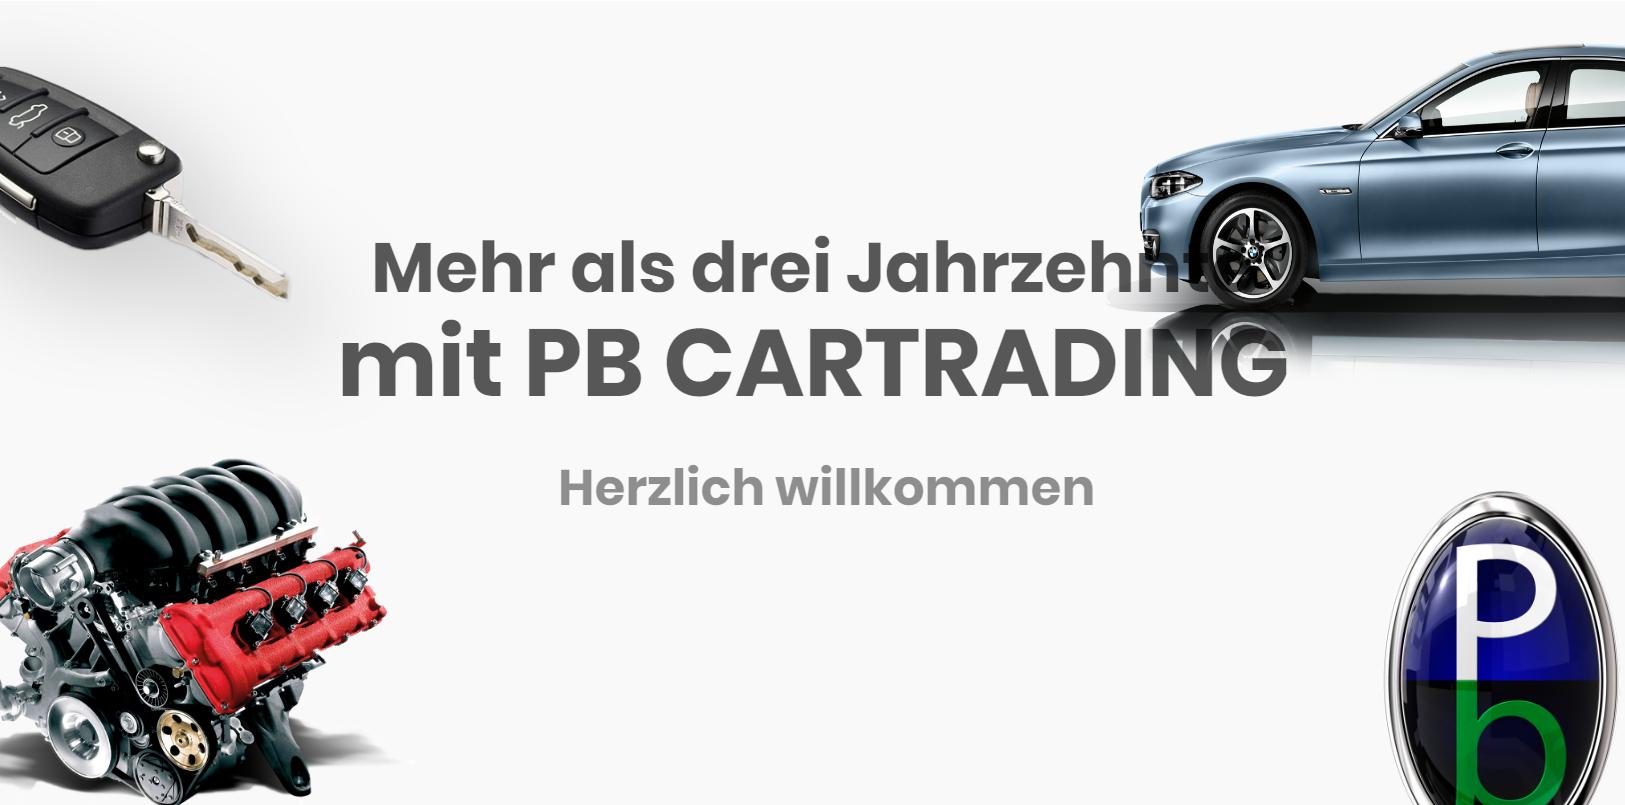 Autrado Lieferant - PB Cartrading ApS Fahrzeuggroßhandel